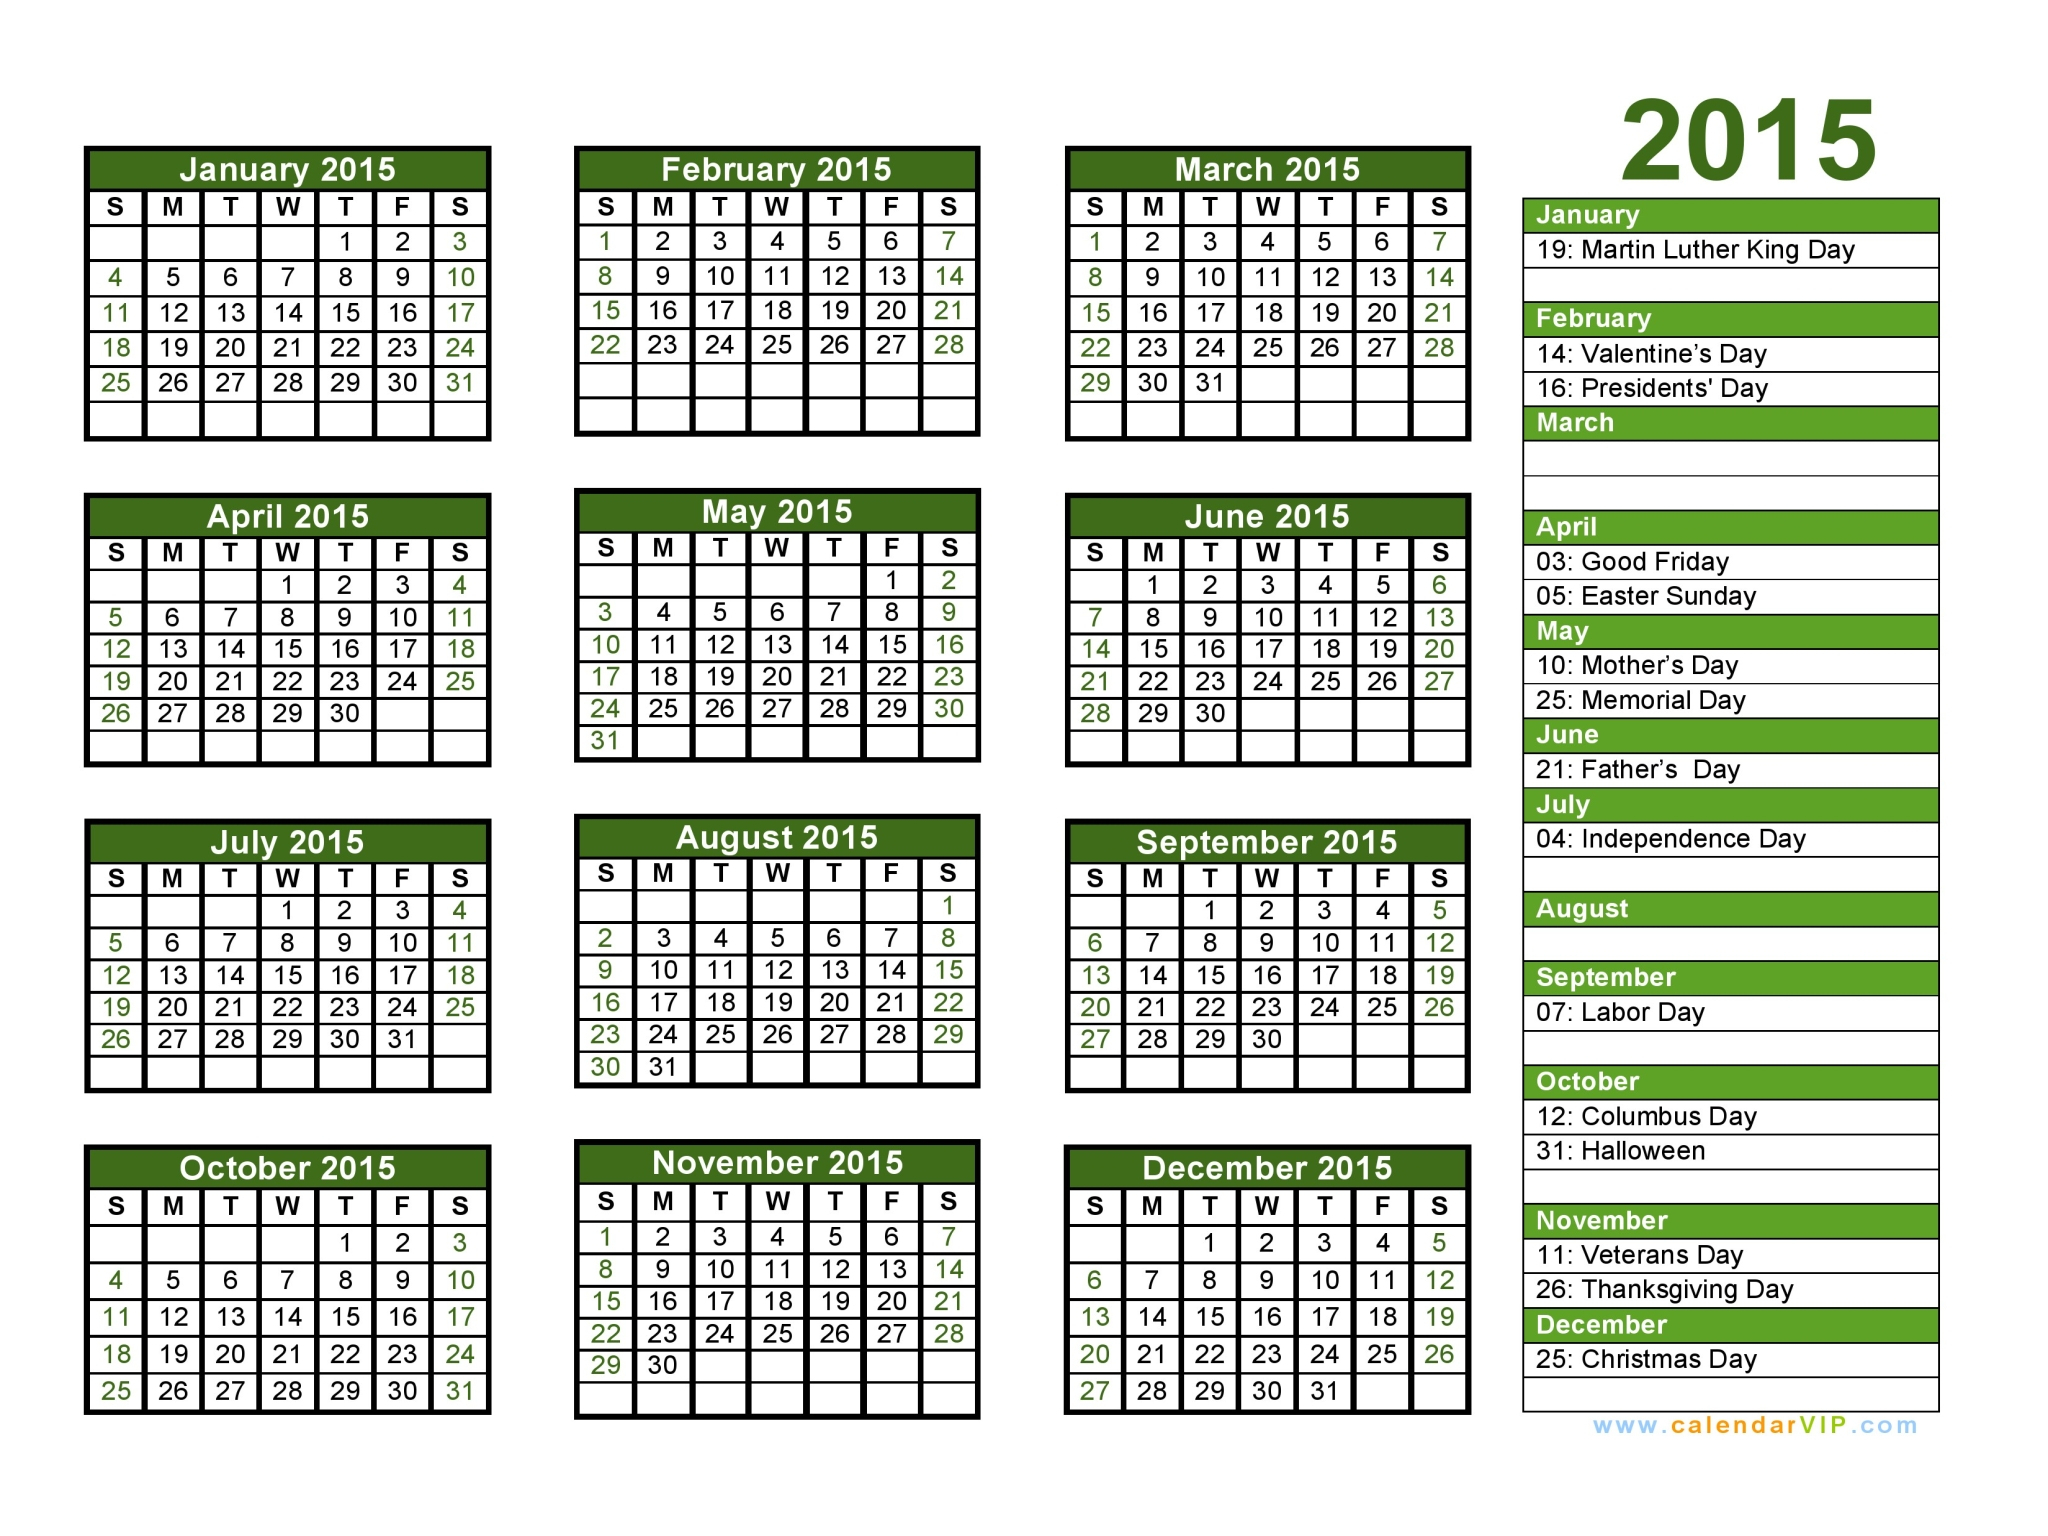 2015 Calendar - Blank Printable Calendar Template In Pdf Word Excel intended for 2014 12 Month Blank Calendar